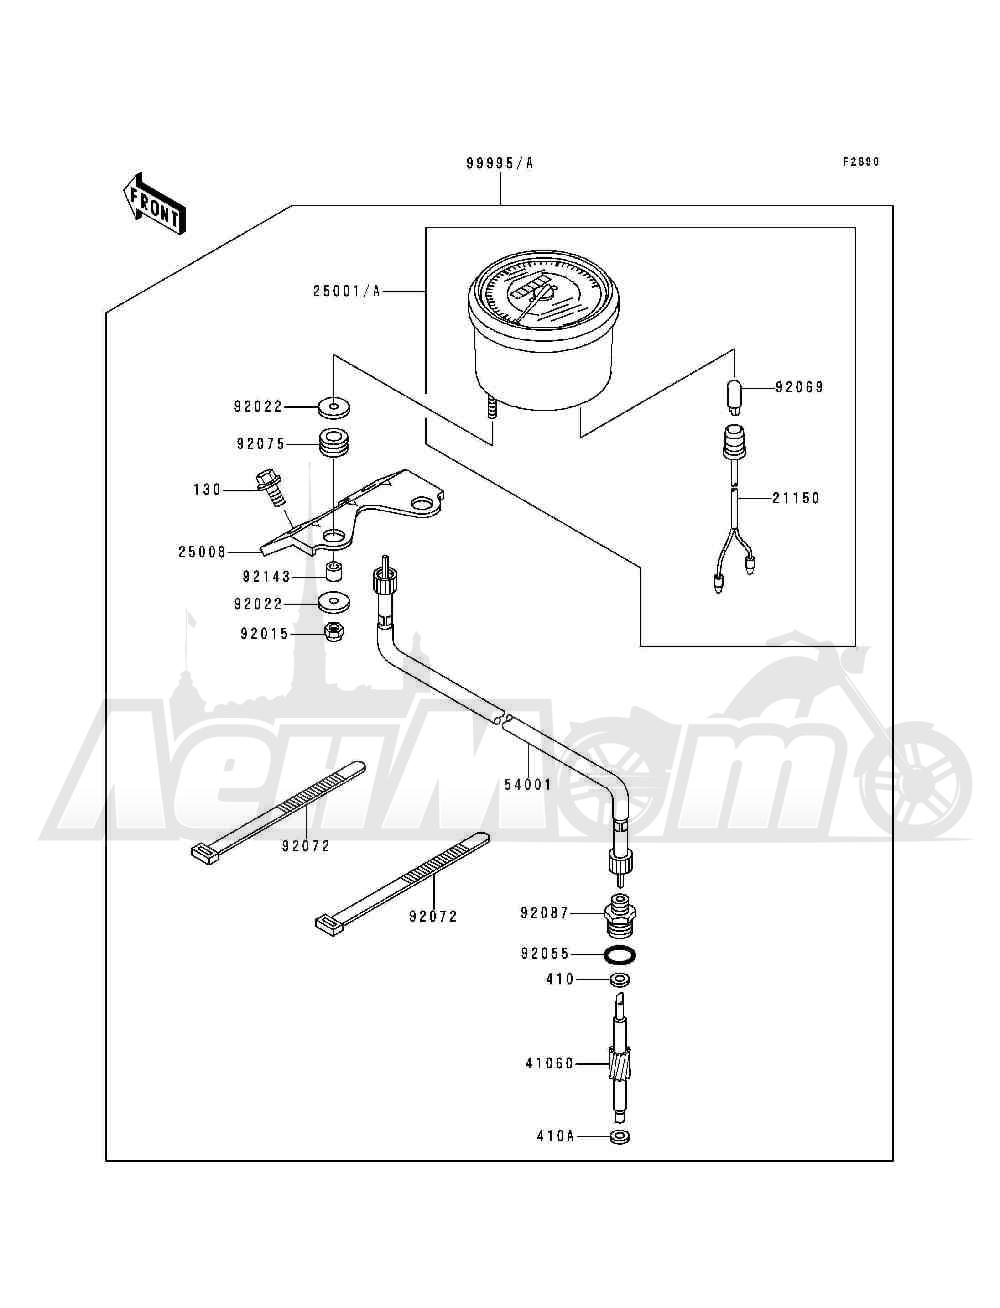 Запчасти для Квадроцикла Kawasaki 1993 BAYOU 300 (KLF300-B6) Раздел: OPTIONAL PARTS(METER)   опционально детали (счетчик)